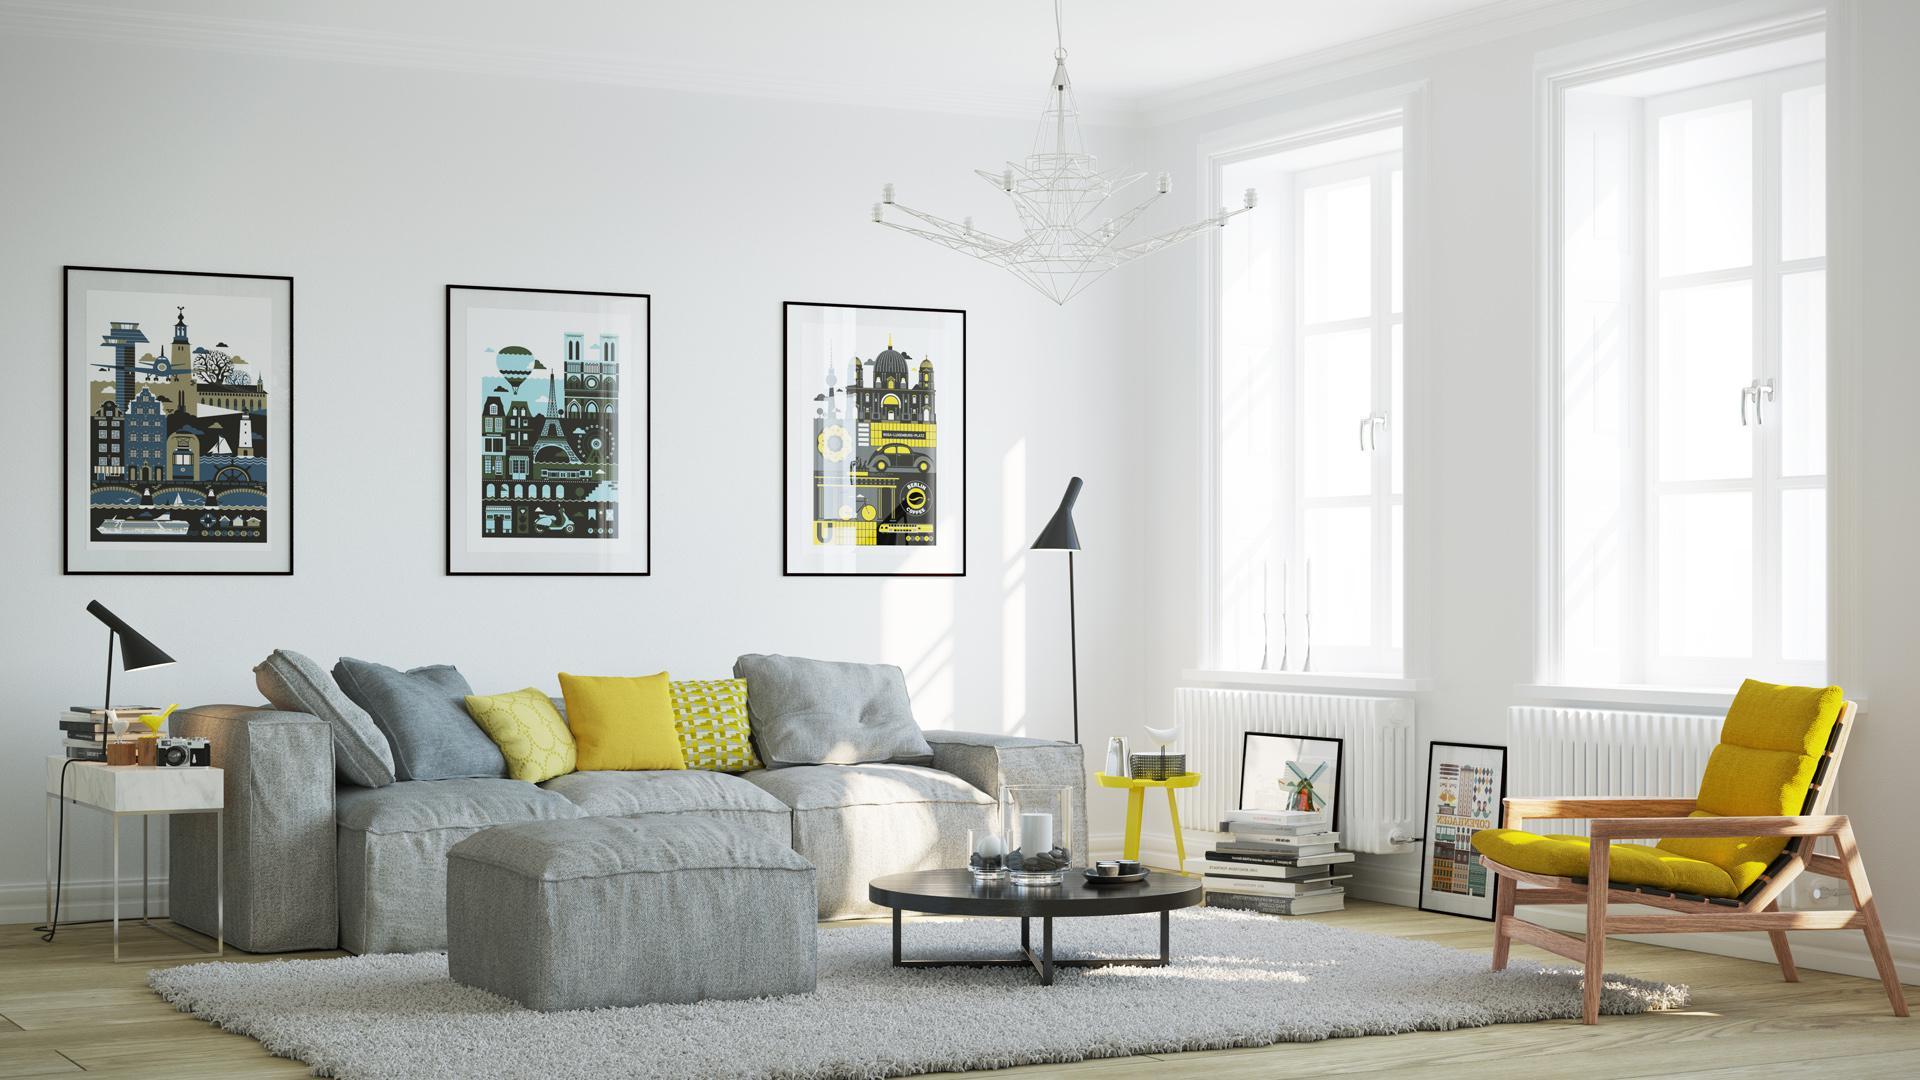 идеи интерьера вашей квартиры фото 9